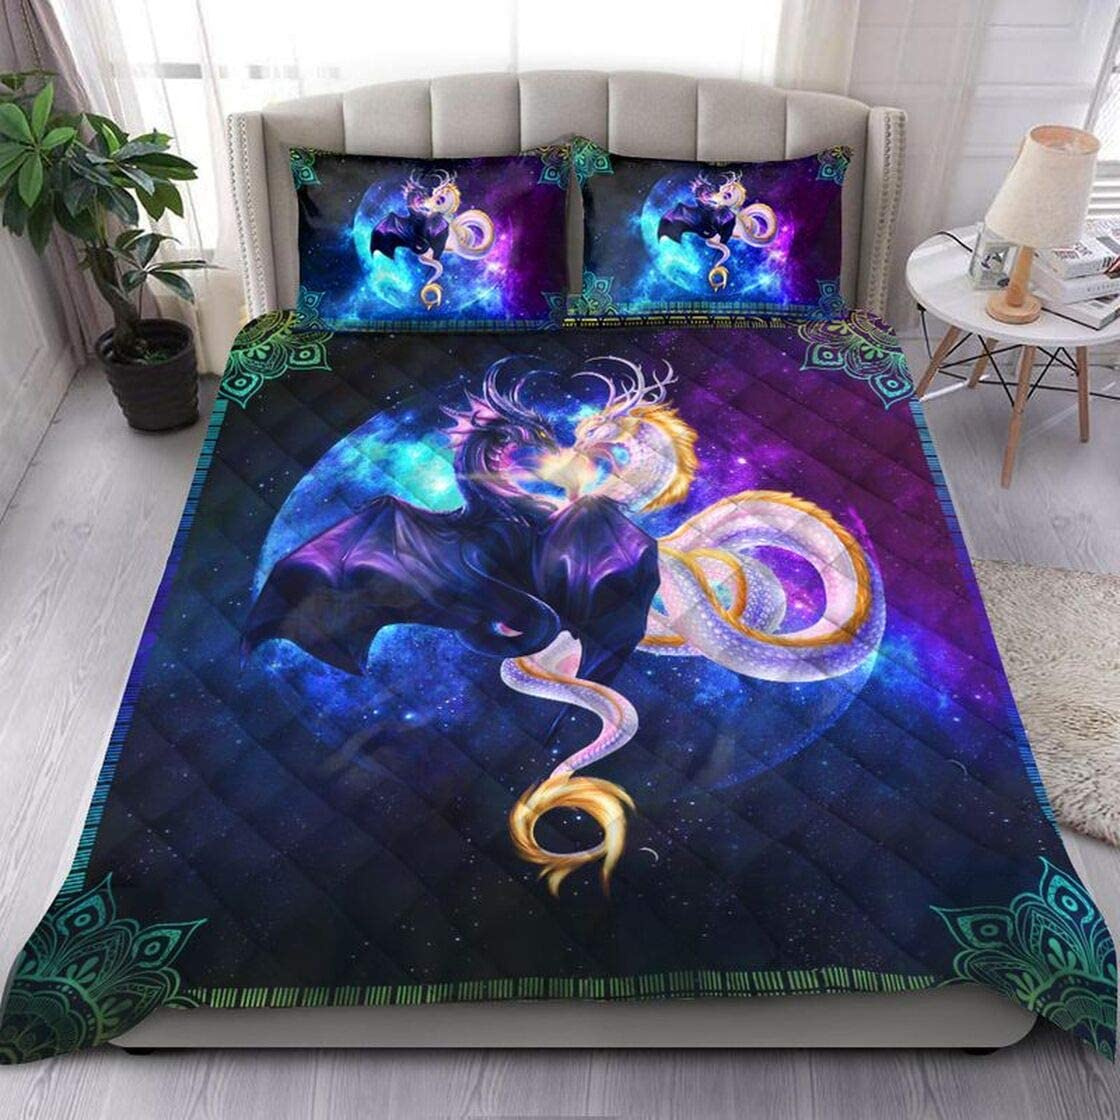 Personalized Galaxy Dragon Art Quilt New York Mall Birthday Dad Oklahoma City Mall Hu to Mom Gift